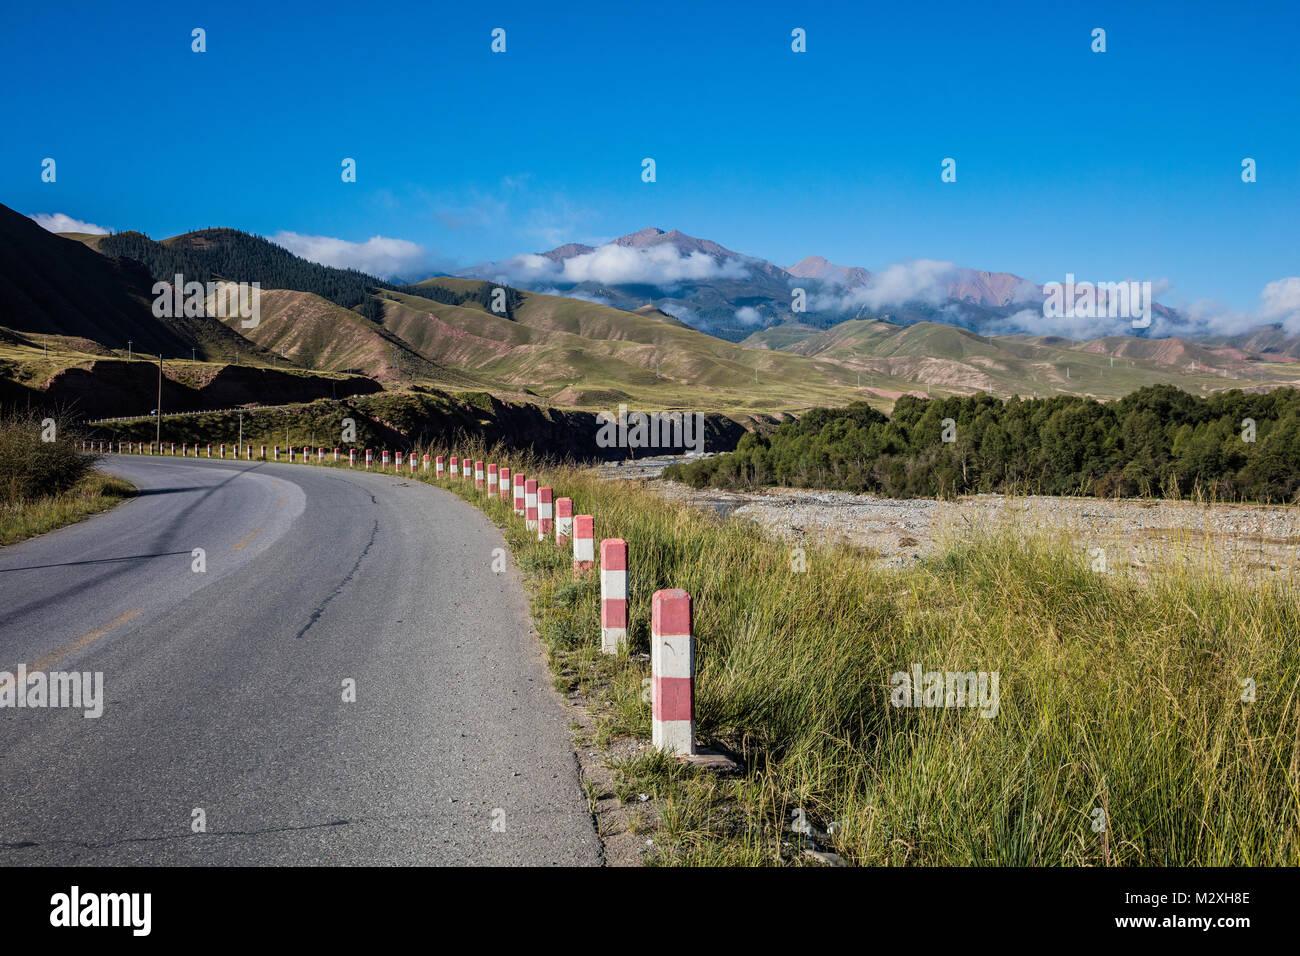 Danxia Geopark, Zhangye, Gansu - Stock Image